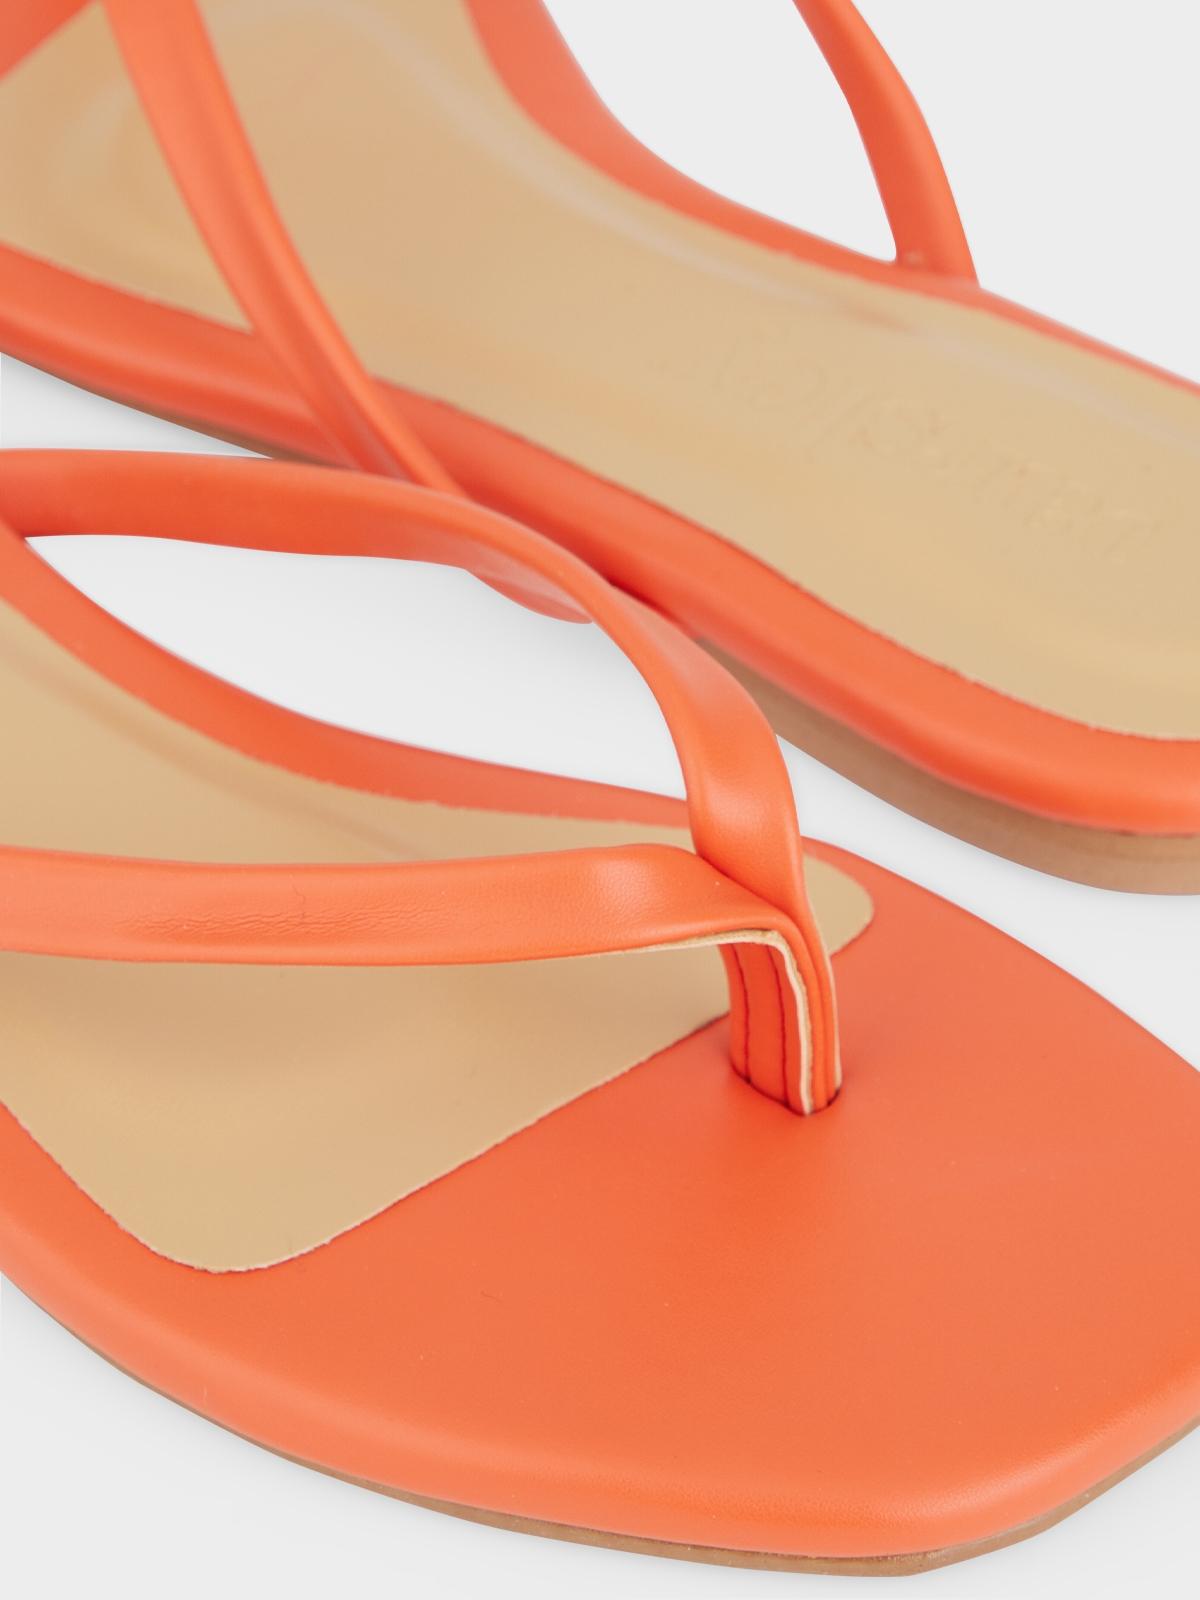 The Parsley Market Bare Sandals Orange